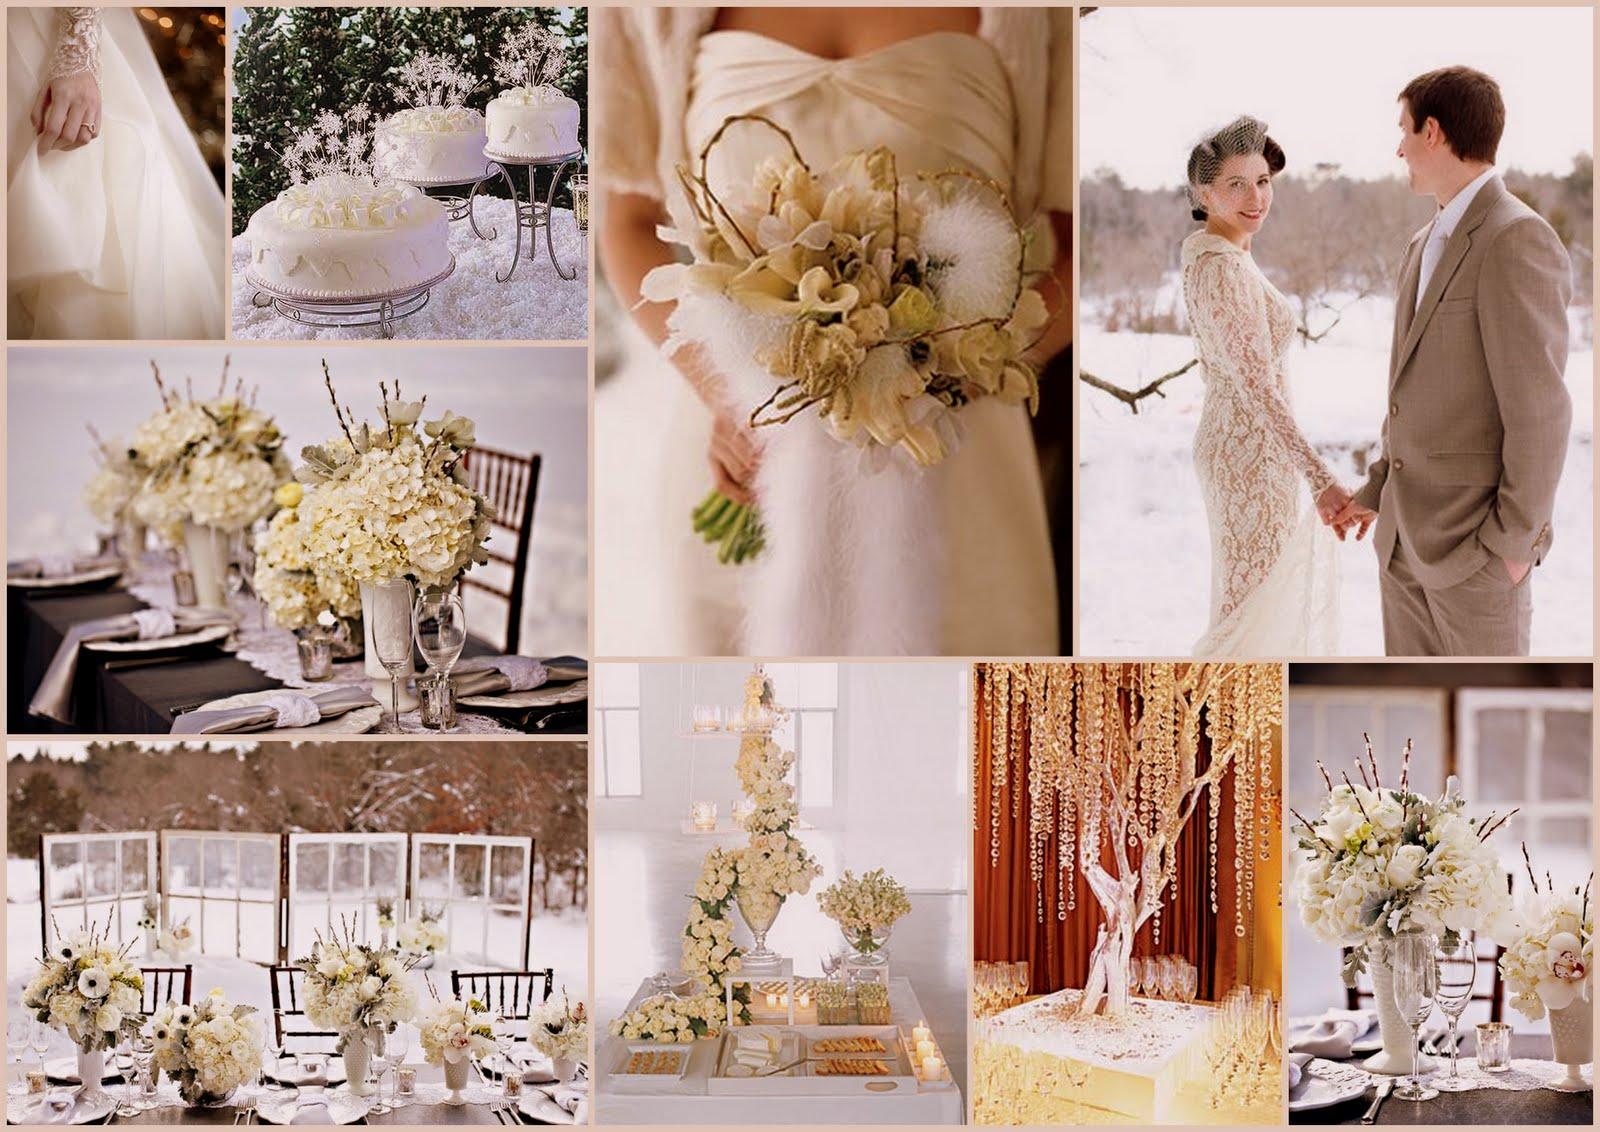 Matrimonio Tema Inverno : La tua wedding planner matrimonio d inverno